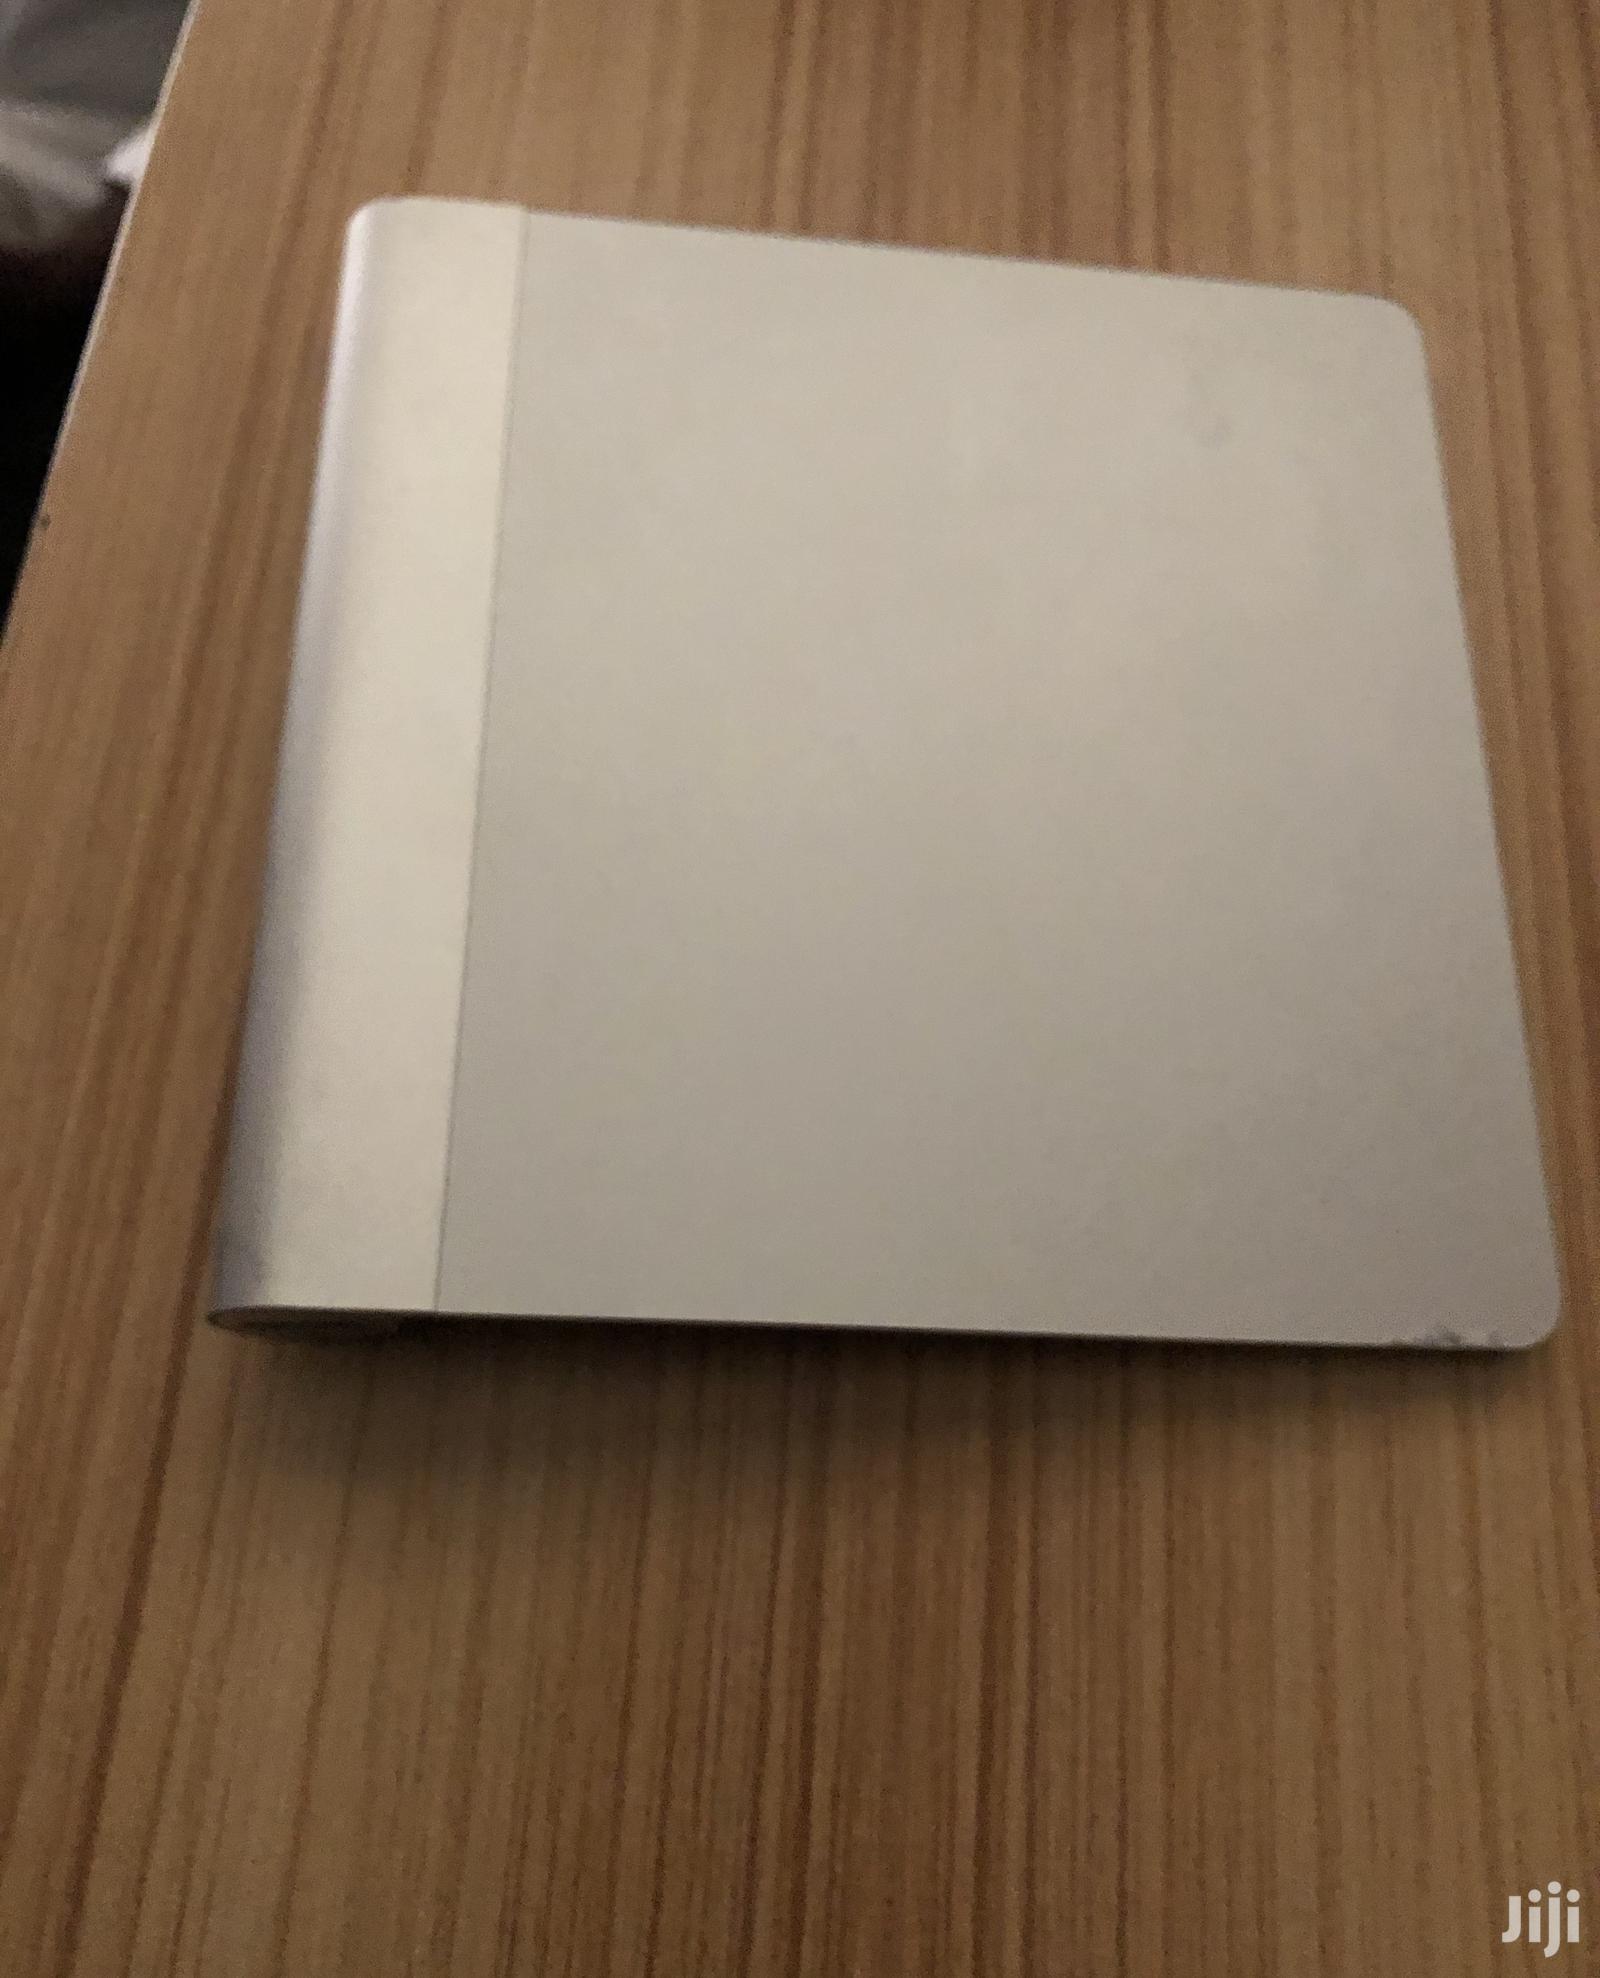 Original Apple Trackpad Series 1 | Computer Accessories  for sale in Kampala, Central Region, Uganda